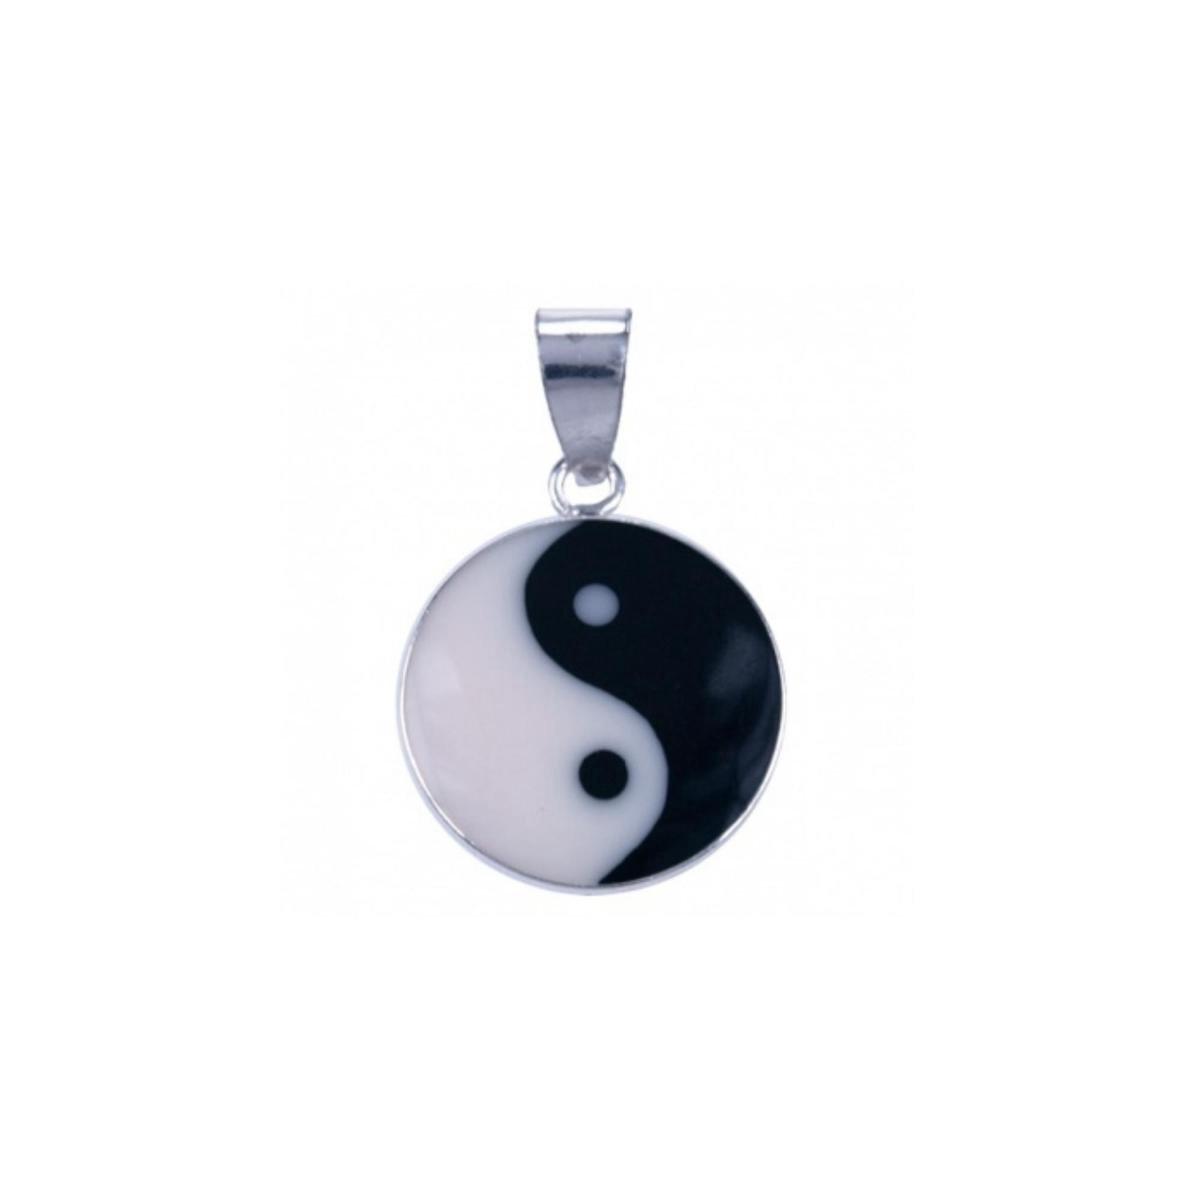 House of Jewels - Klein Zilveren Yin Yang Hanger - 8mm - House of Jewels